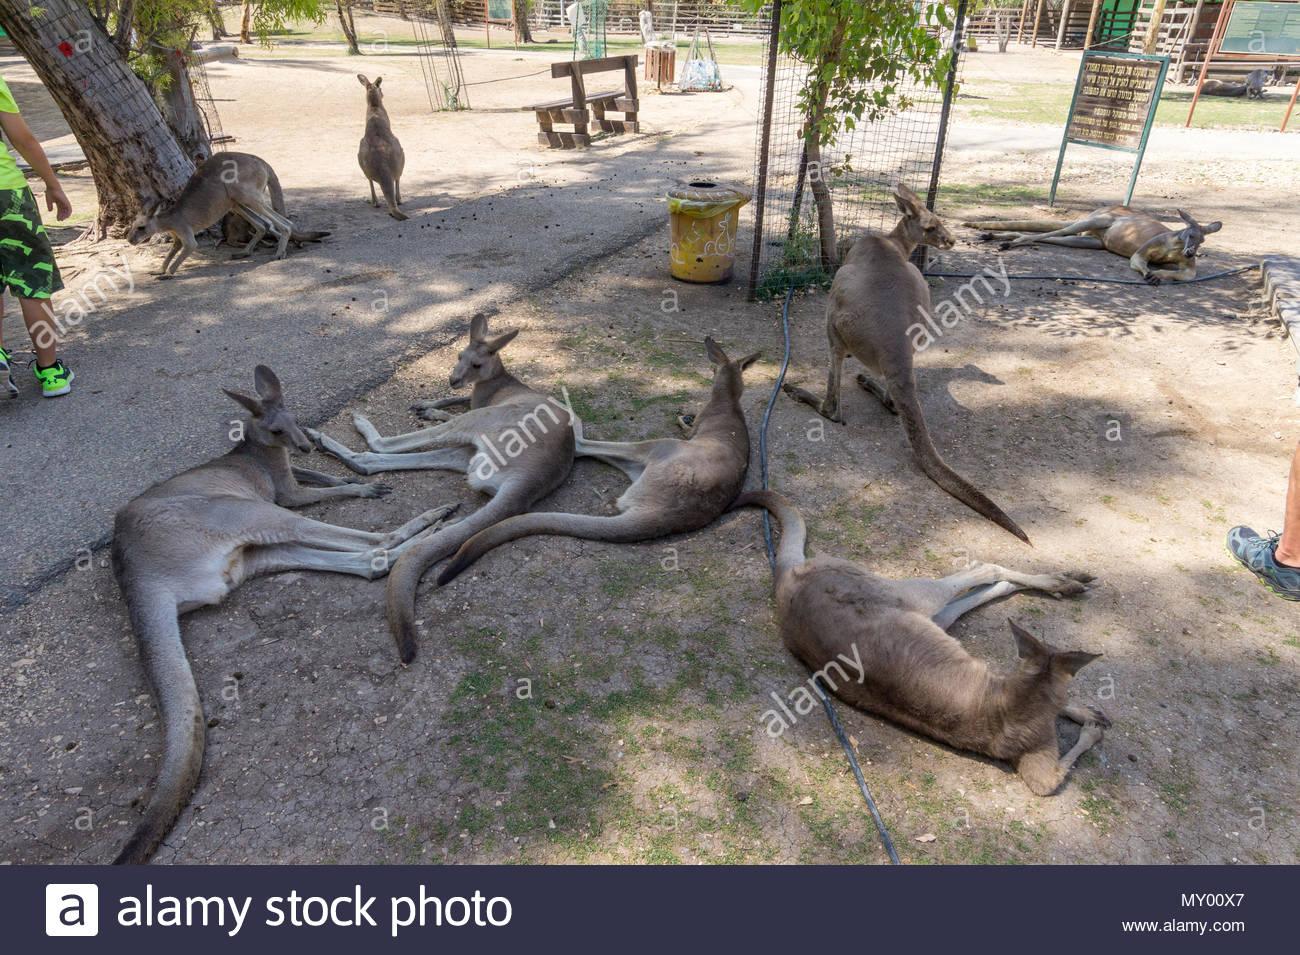 Kangaroos interact with tourists at the Gan Garoo park at Kibbutz Nir David in Israel - Stock Image